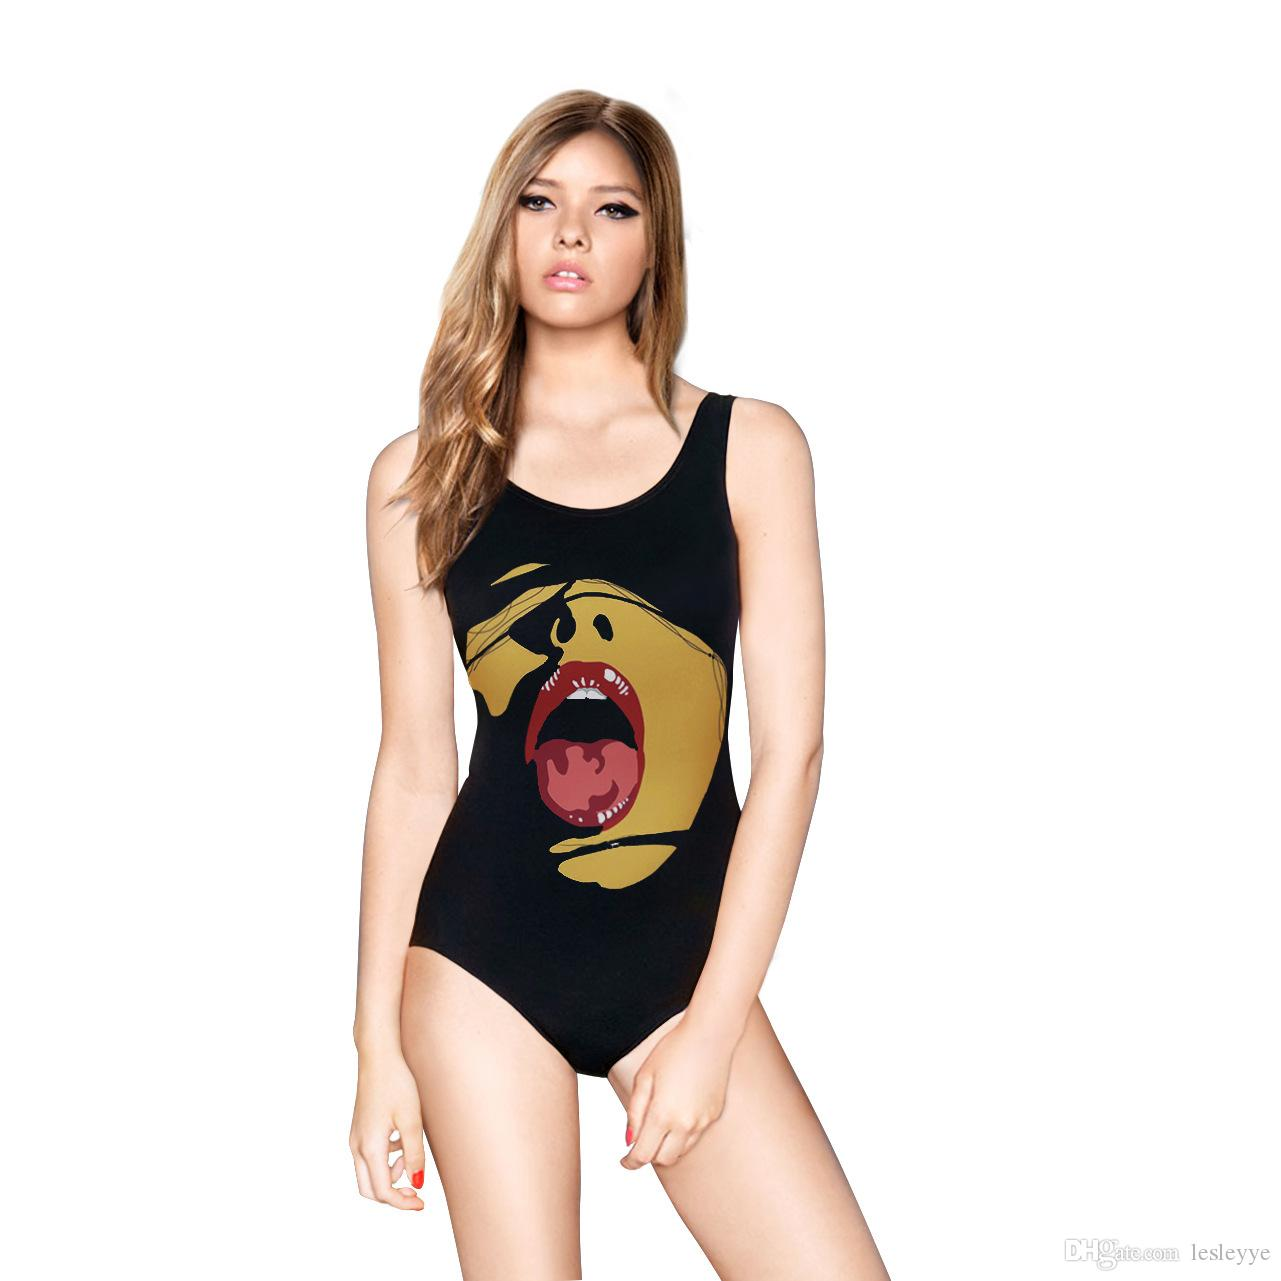 3d طباعة ملابس السباحة مثير النساء بوهيميا مثير قطعة واحدة المايوه النساء monokini زائد حجم ملابس النساء السباحة ارتداء قطعة واحدة الاستحمام